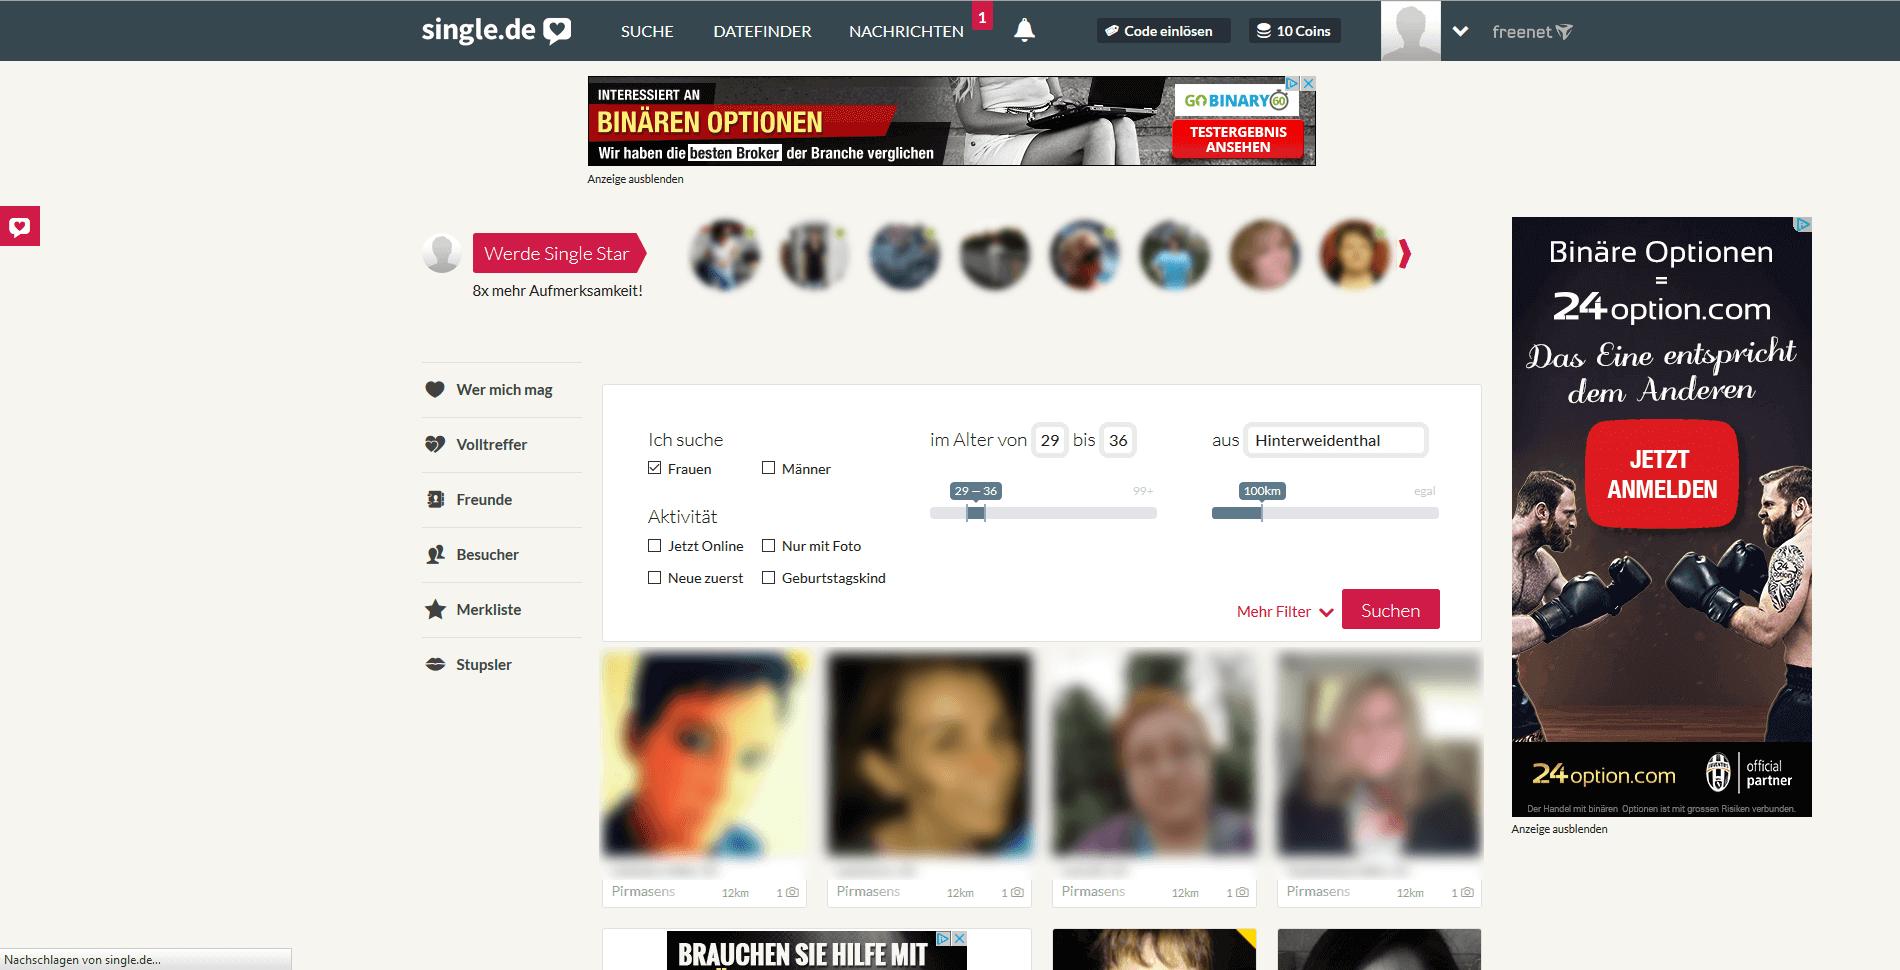 Daten-Websites für lokale Singles